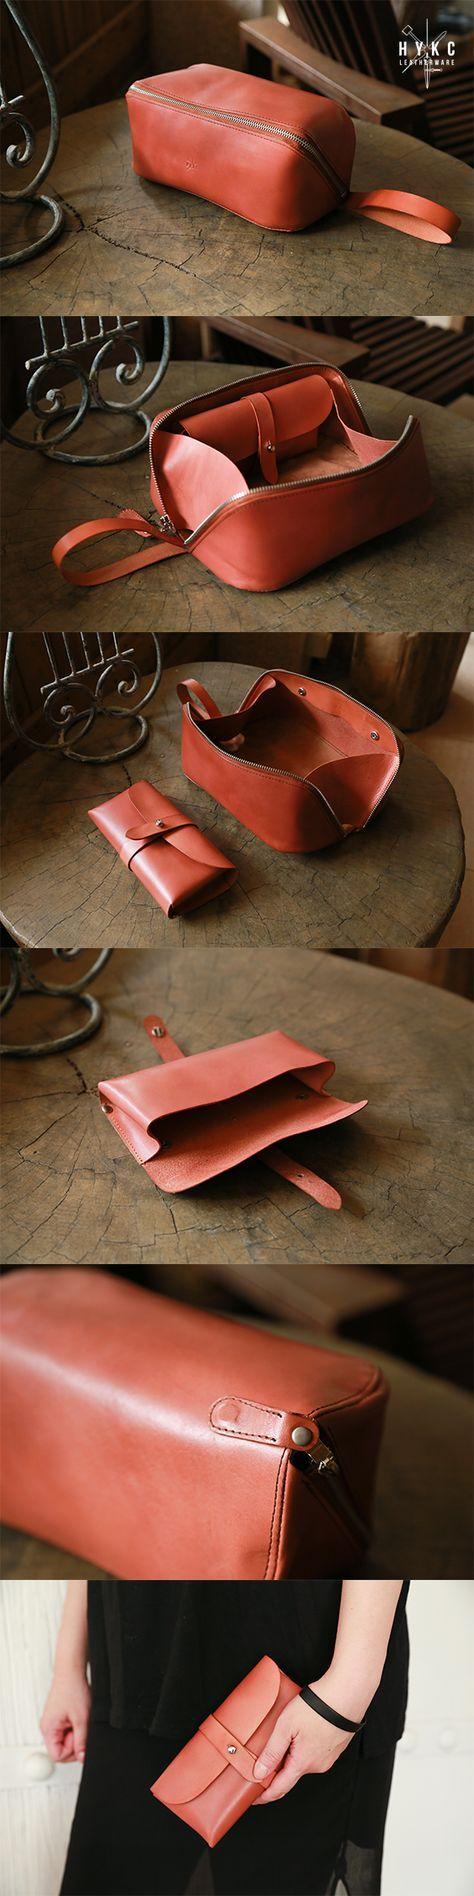 Toilerery Bag from hykc leatherware